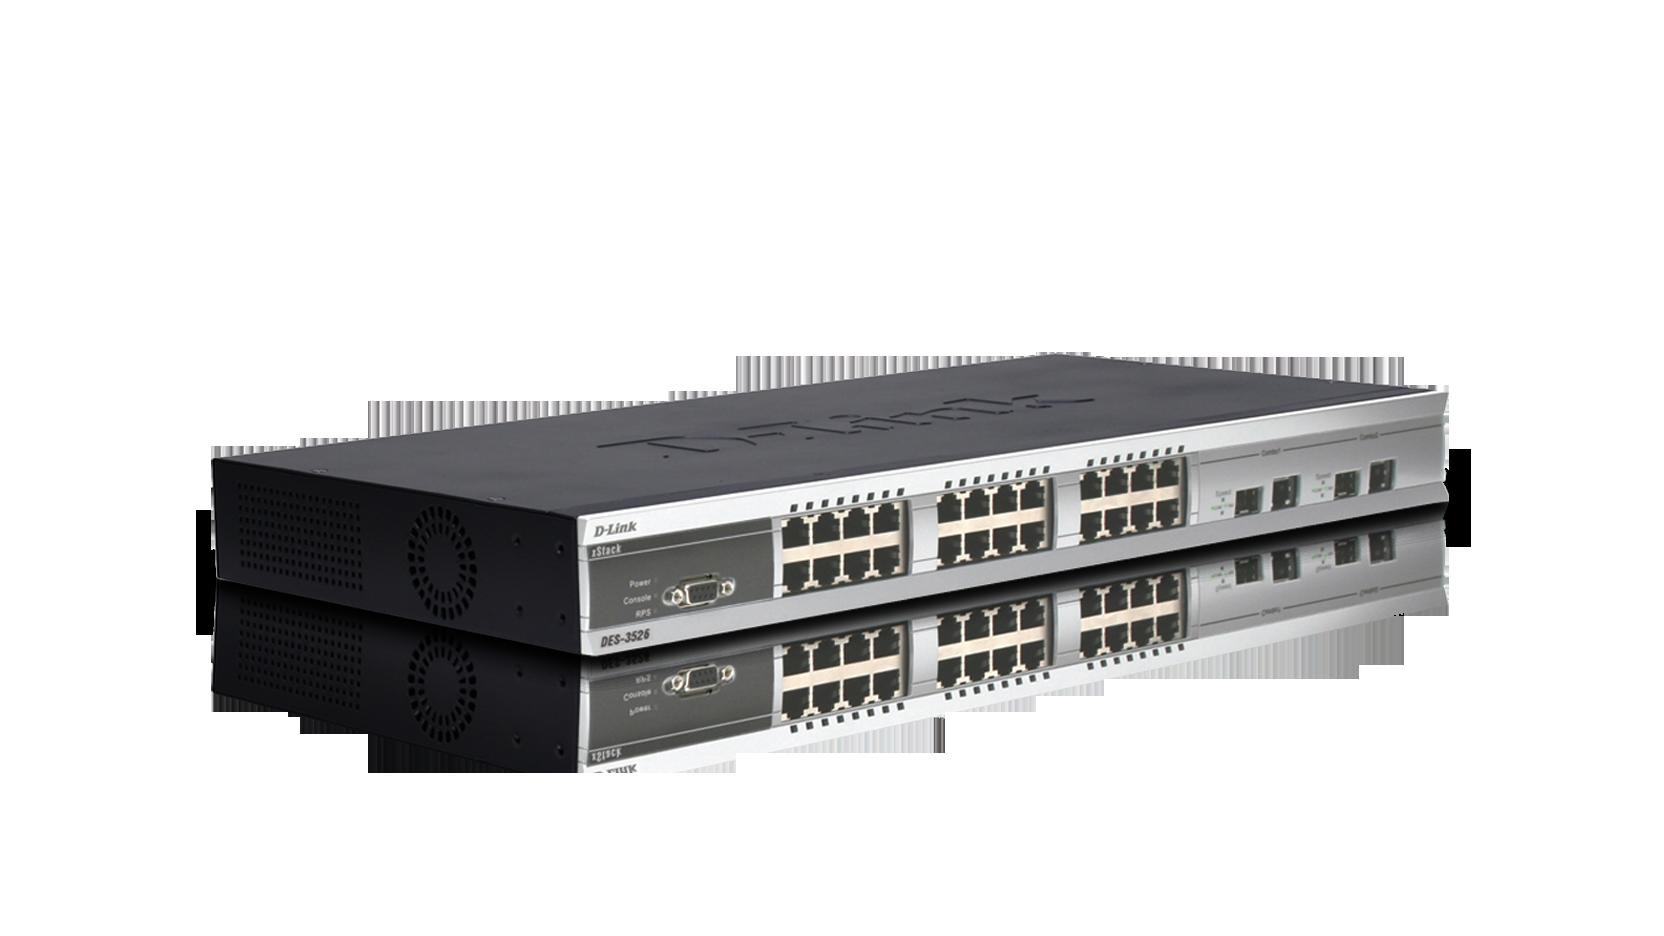 DLINK DES-3526 Switch Drivers Download Free